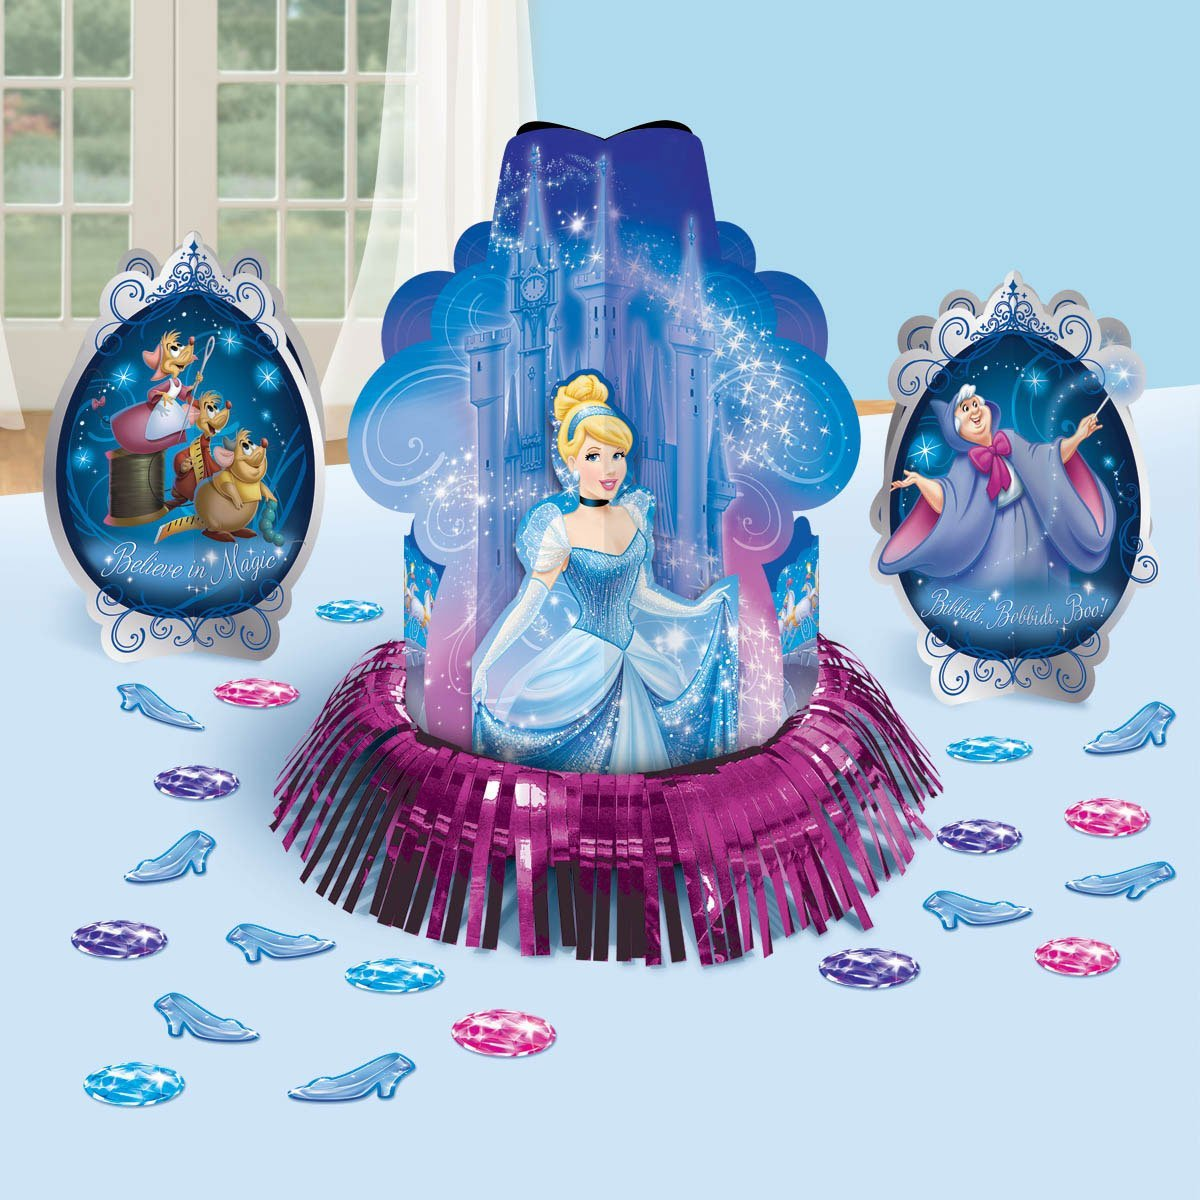 Cinderella 'Sparkle' Table Decorating Kit (23pc)